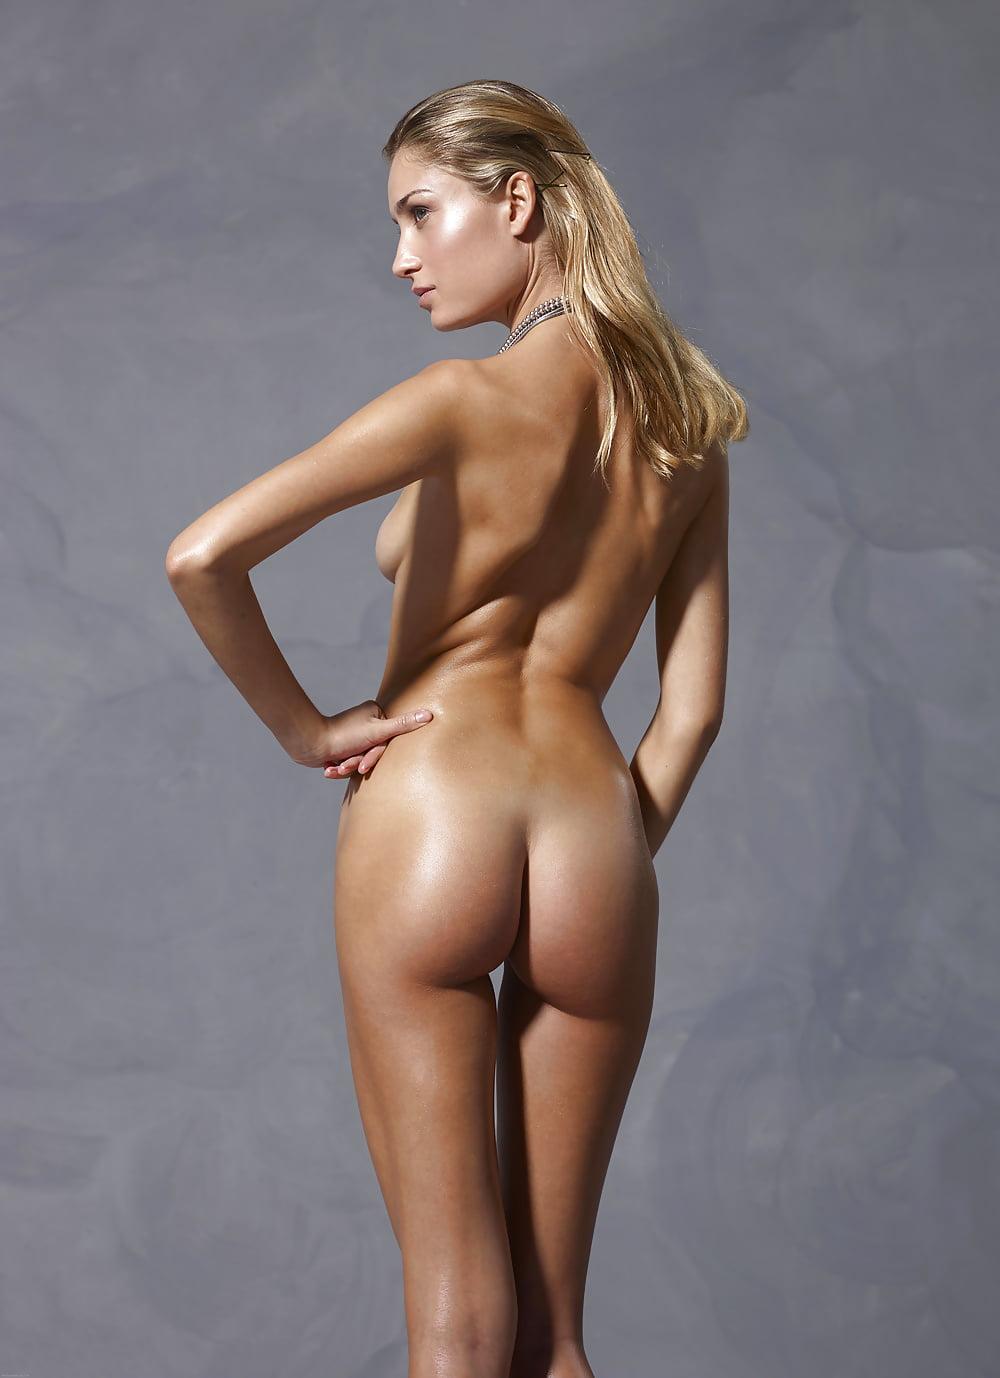 femdom-tube-top-model-nude-pic